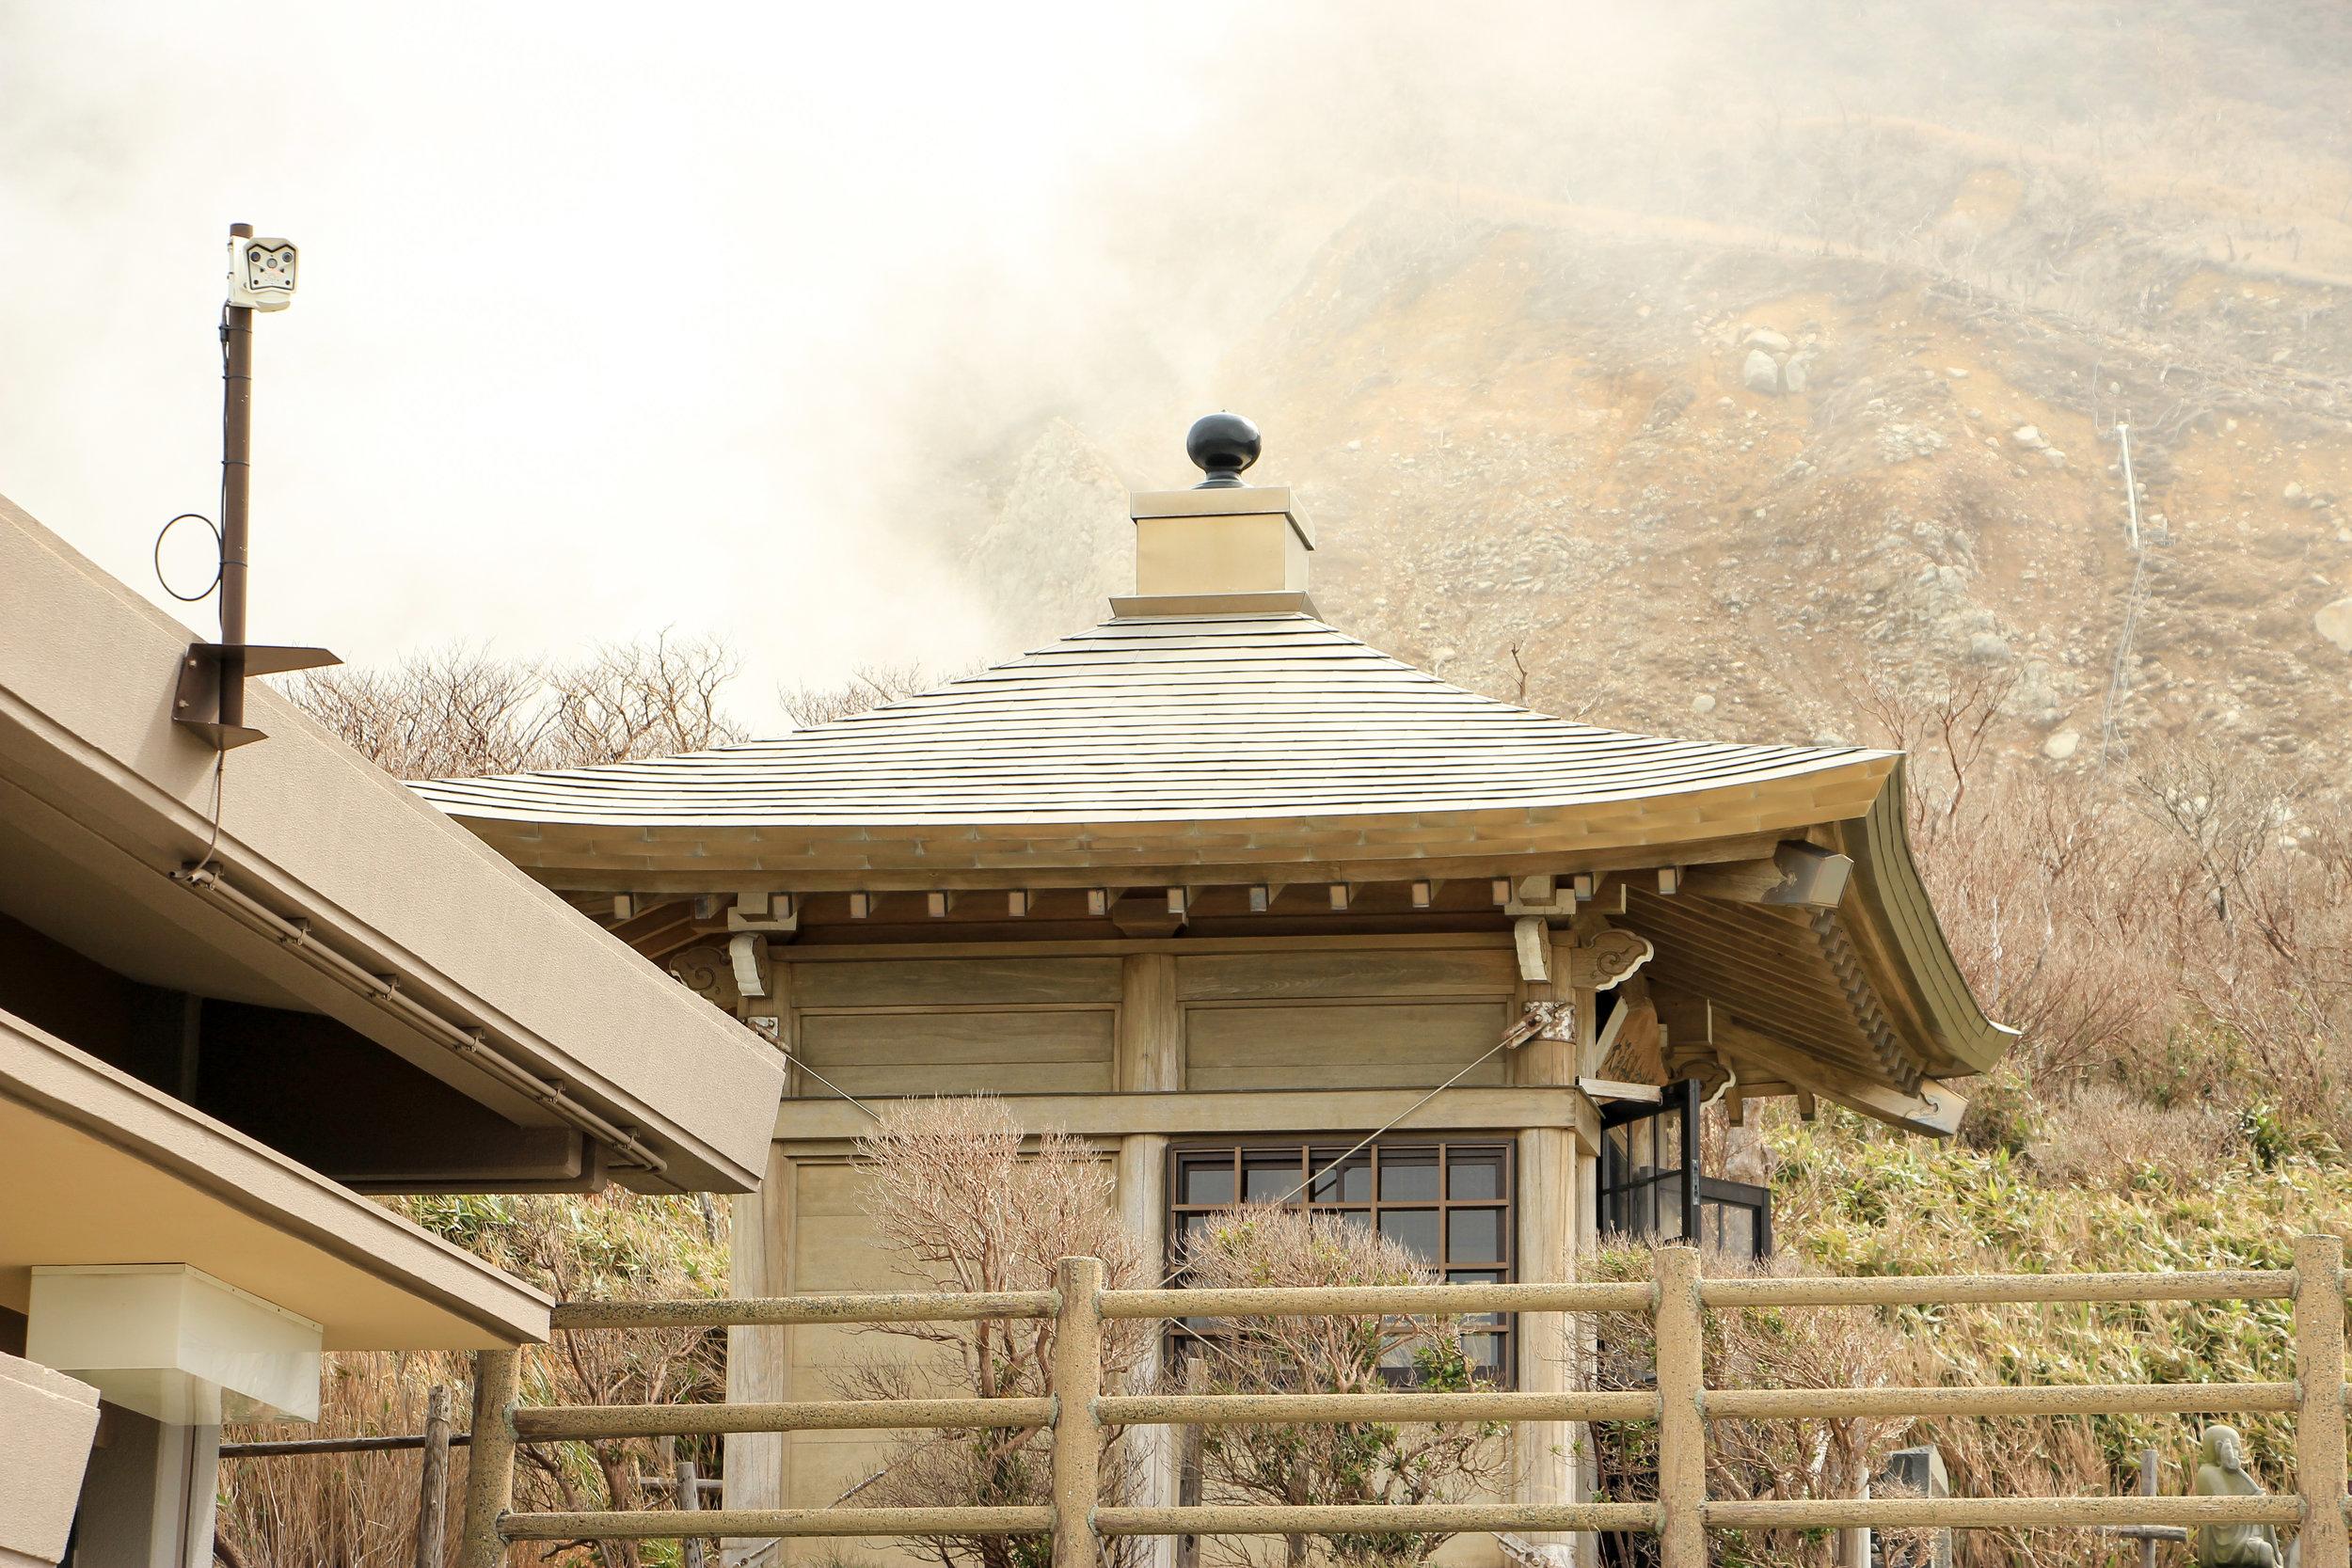 Hakone In A Simple Way Like That | Owakudani, Hakone, Volcano | Fuji-Hakone-Izu National Park, Japan, Asia | DoLessGetMoreDone.com |